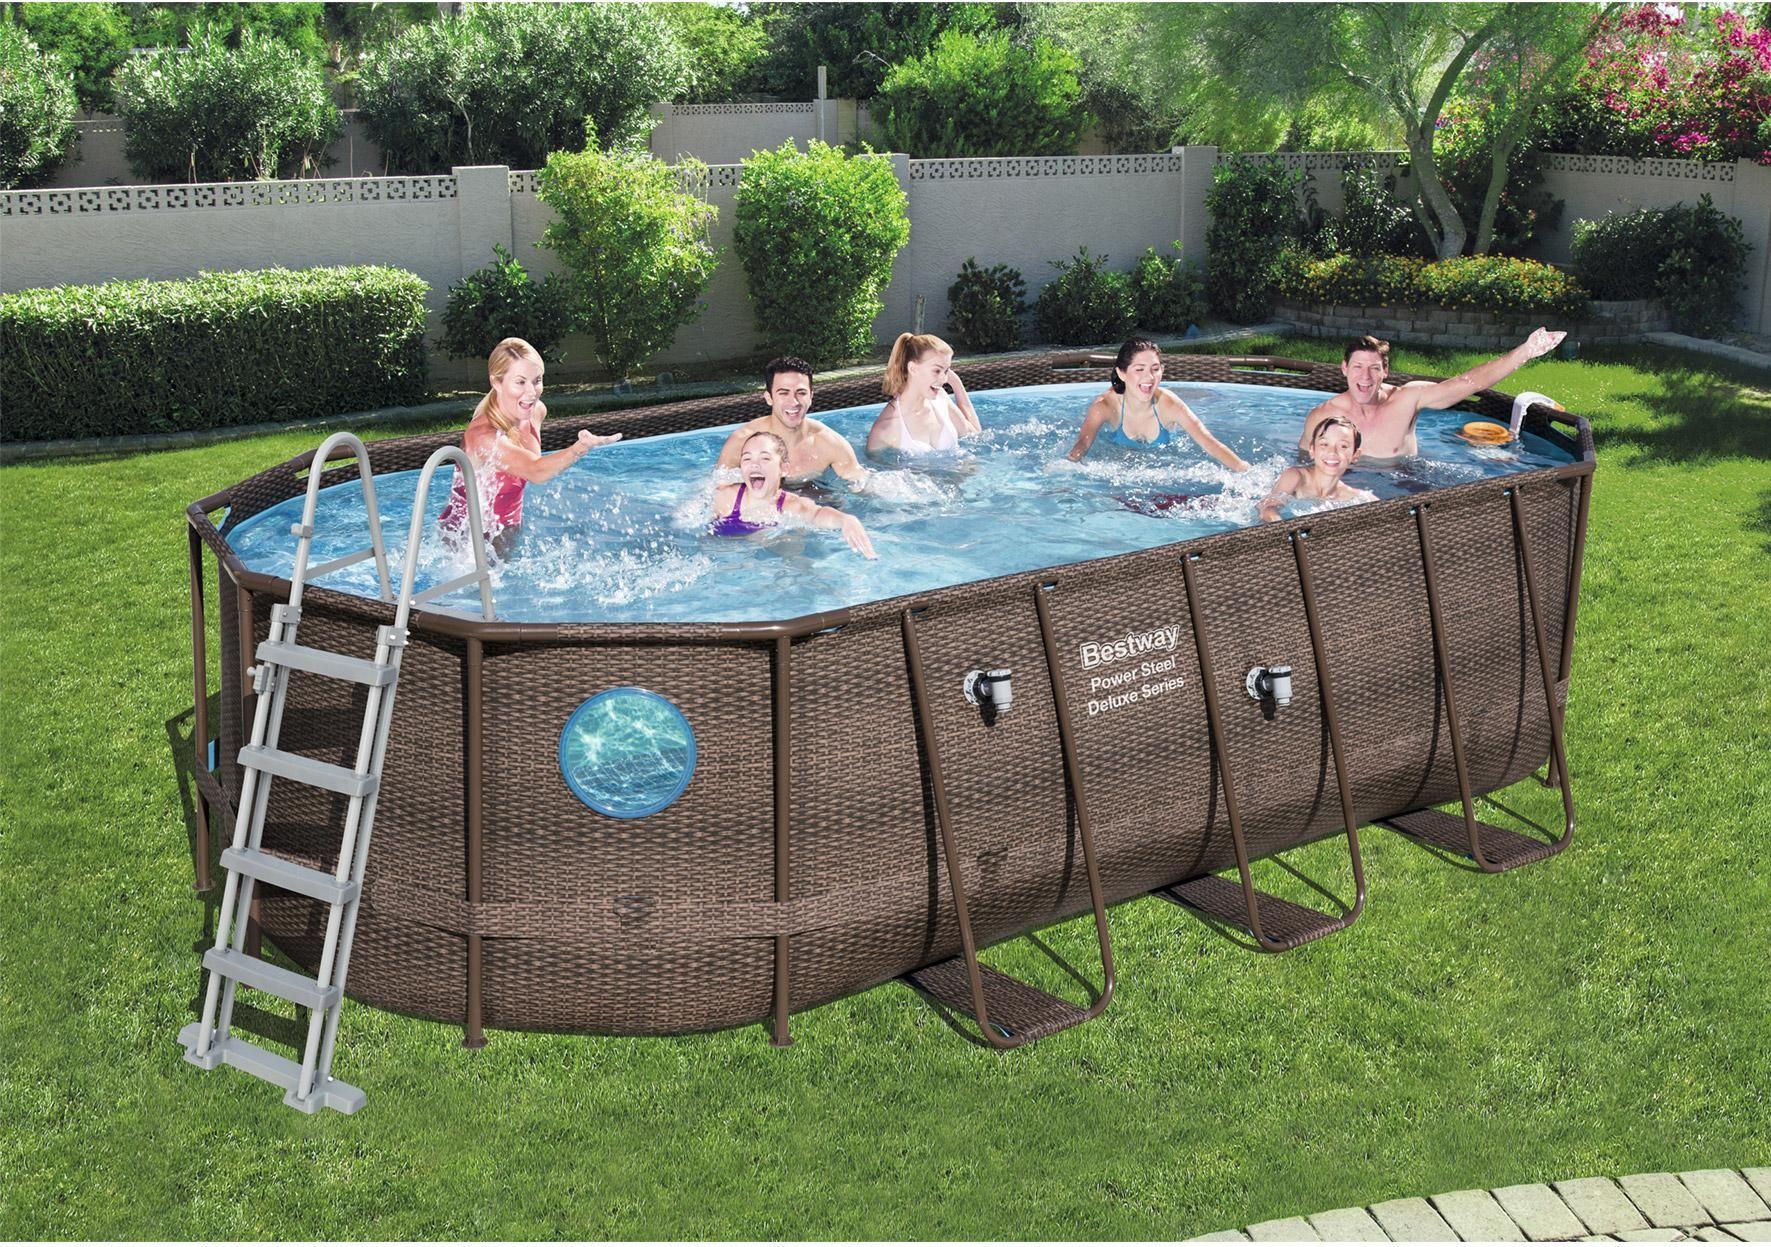 Piscine Hors-Sol Tubulaire Swim Vista Pool Bestway, L.5.49 X ... encequiconcerne Piscine Bestway Avis